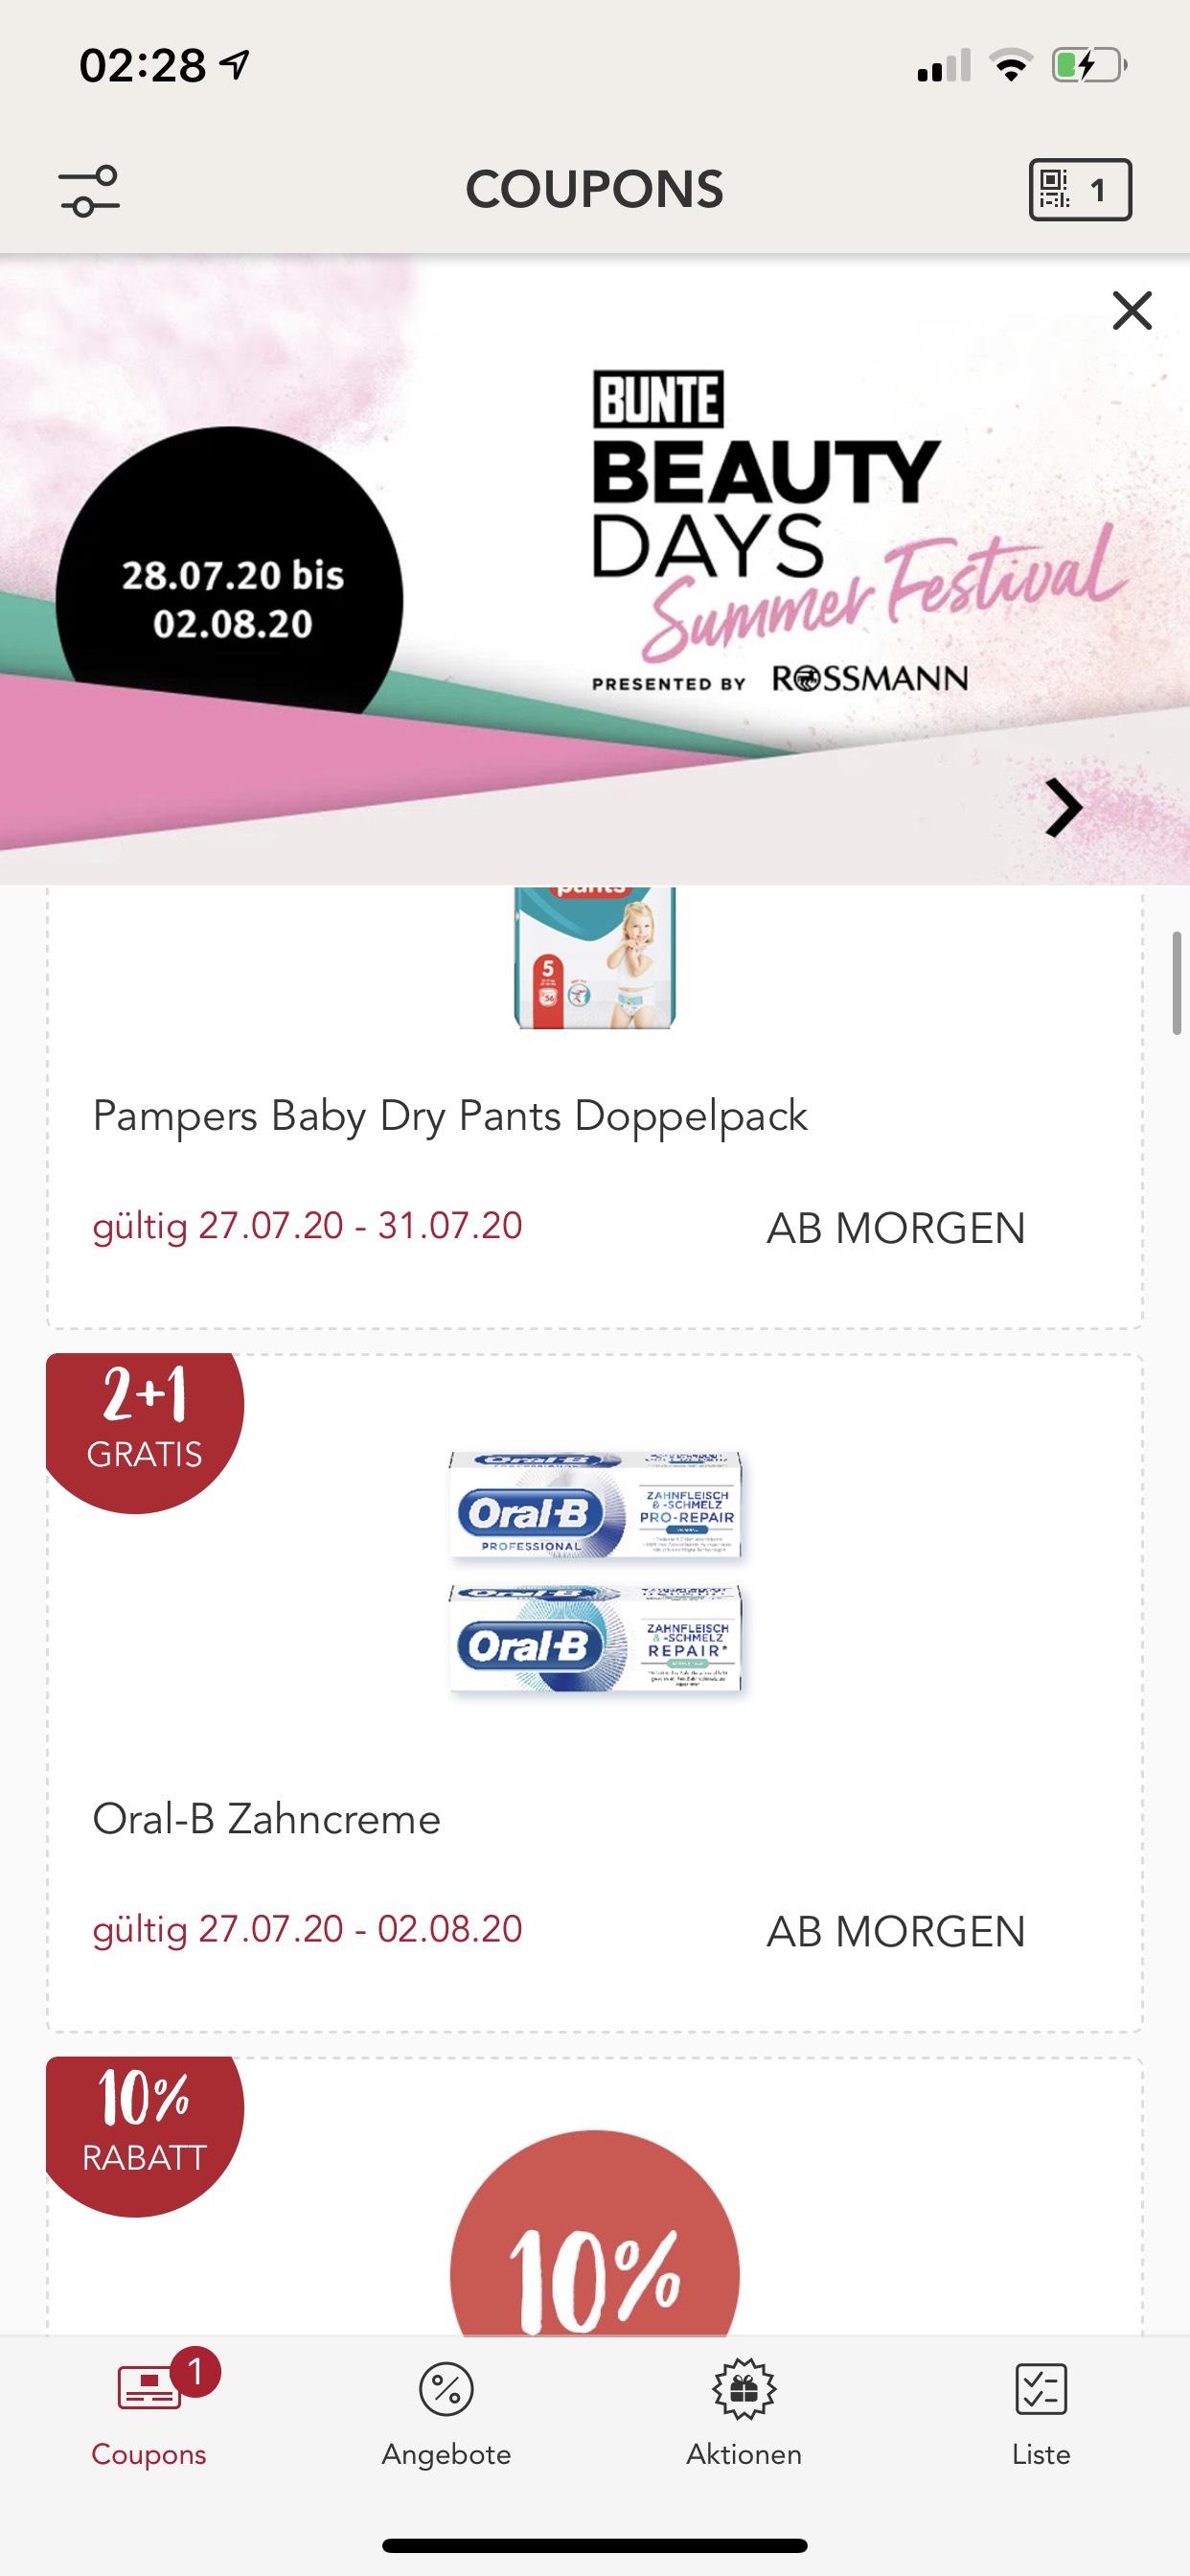 (Rossmann App) 2 plus 1 - Oral-B Zahncreme